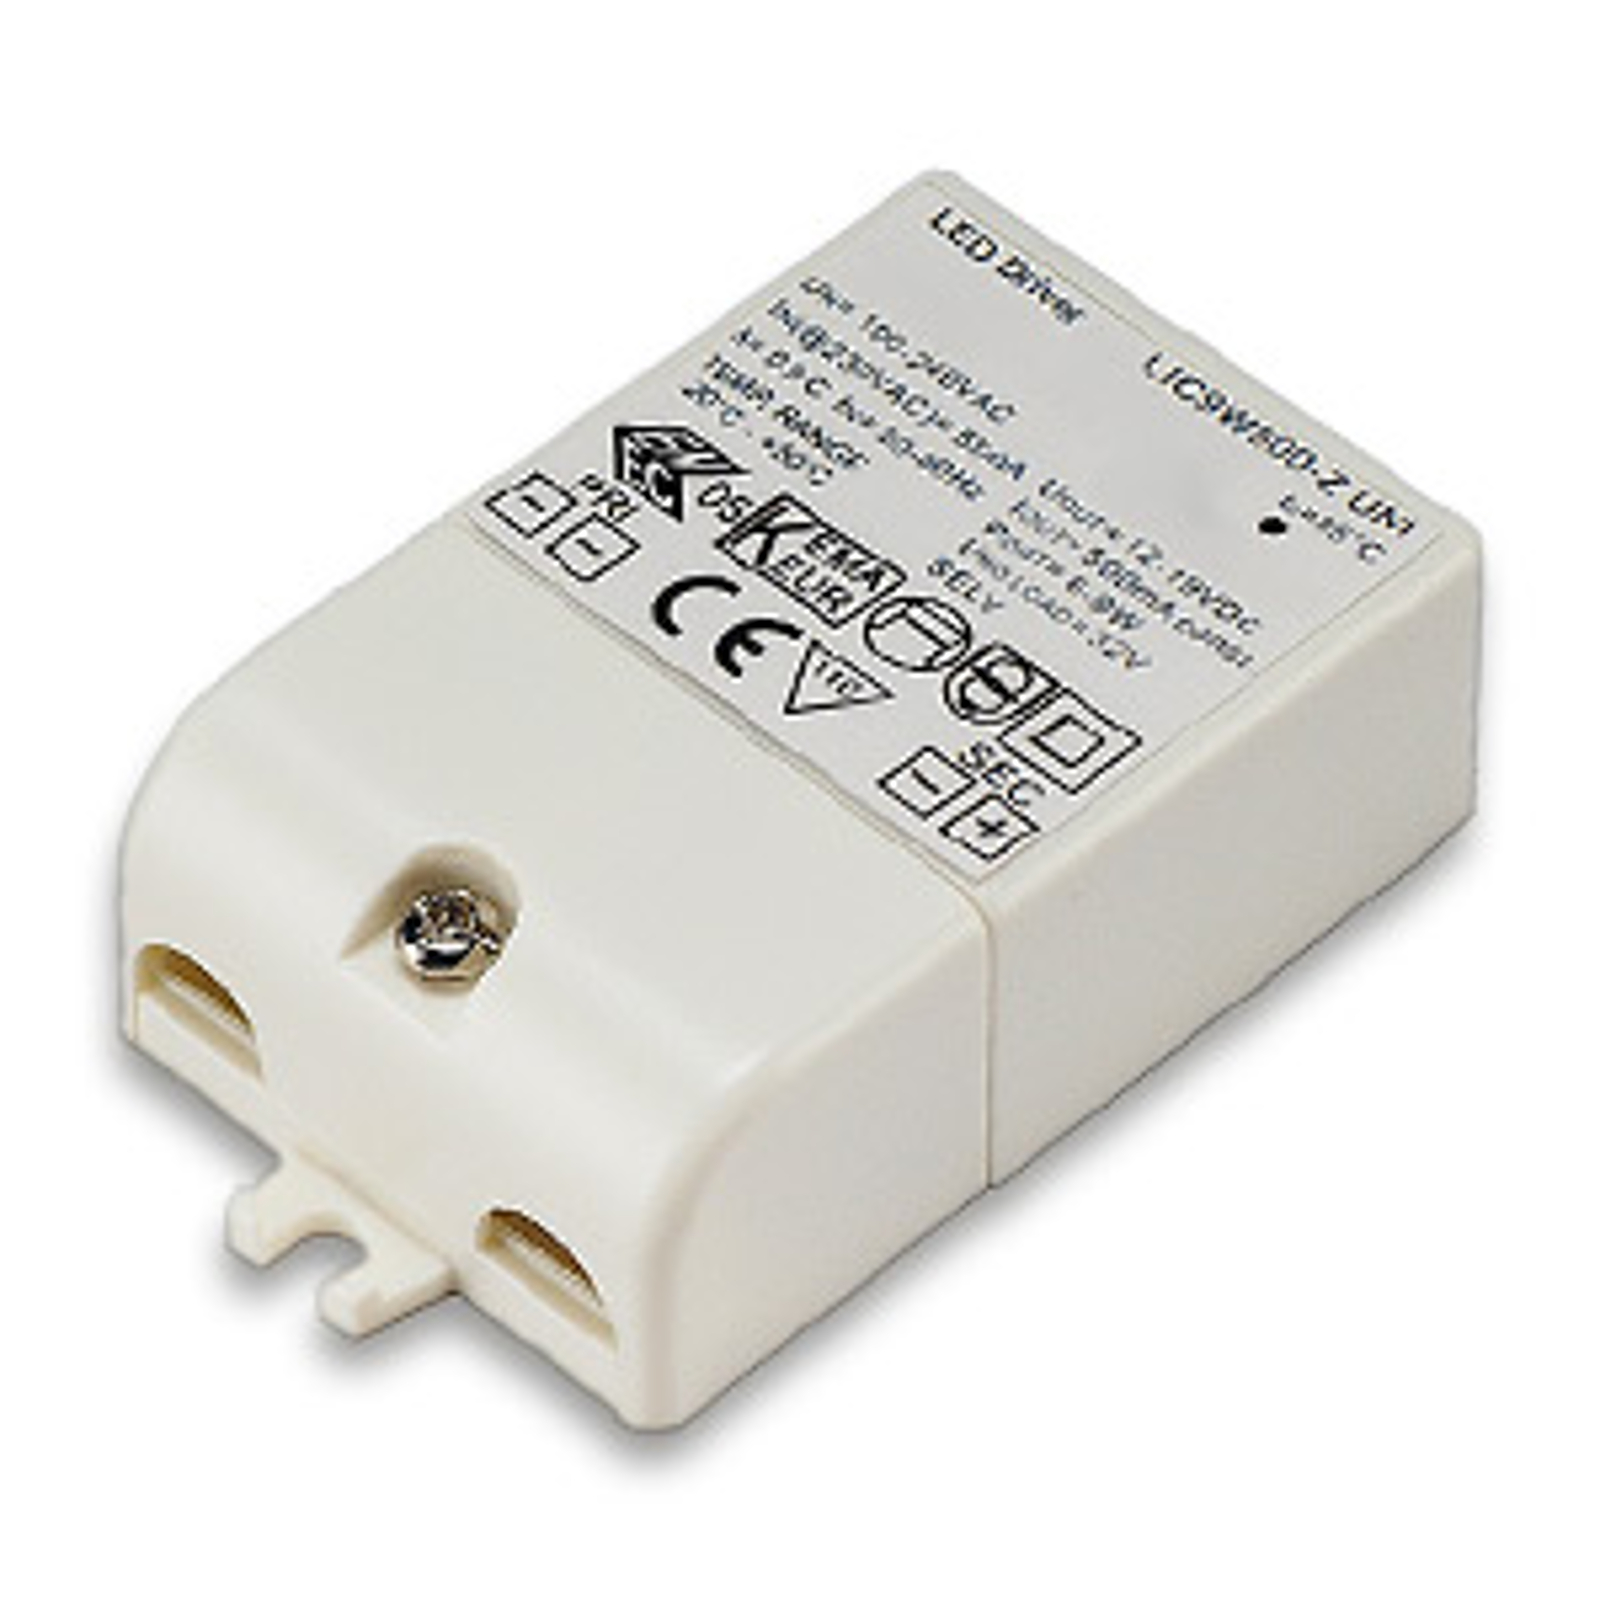 SLV LED-Treiber 9 W, 500 mA